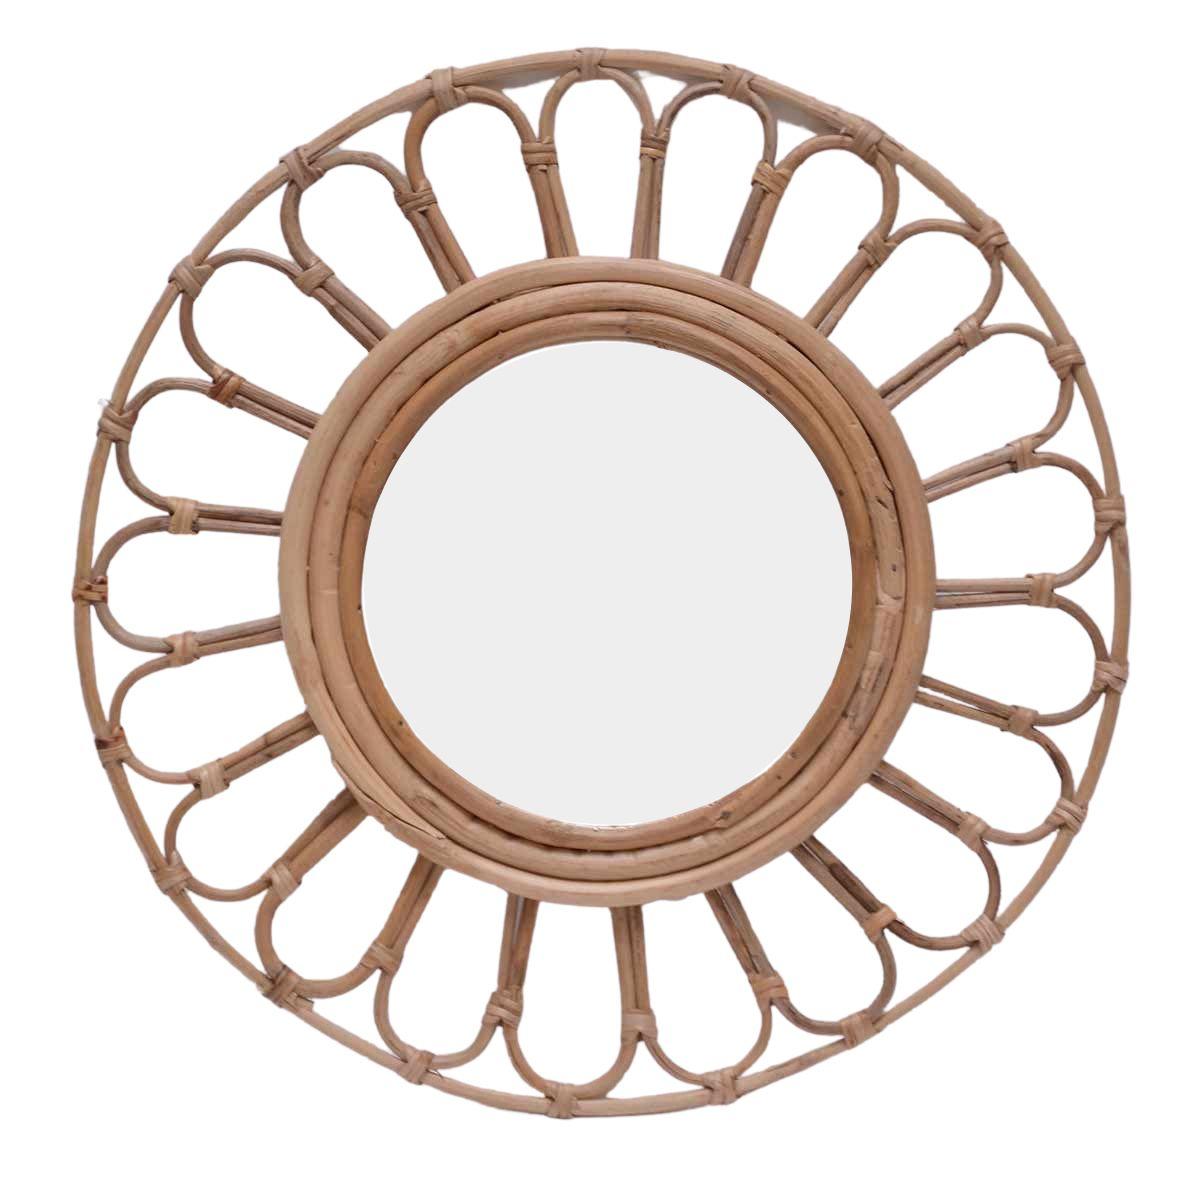 Miroir rond en rotin alma bois clair D20